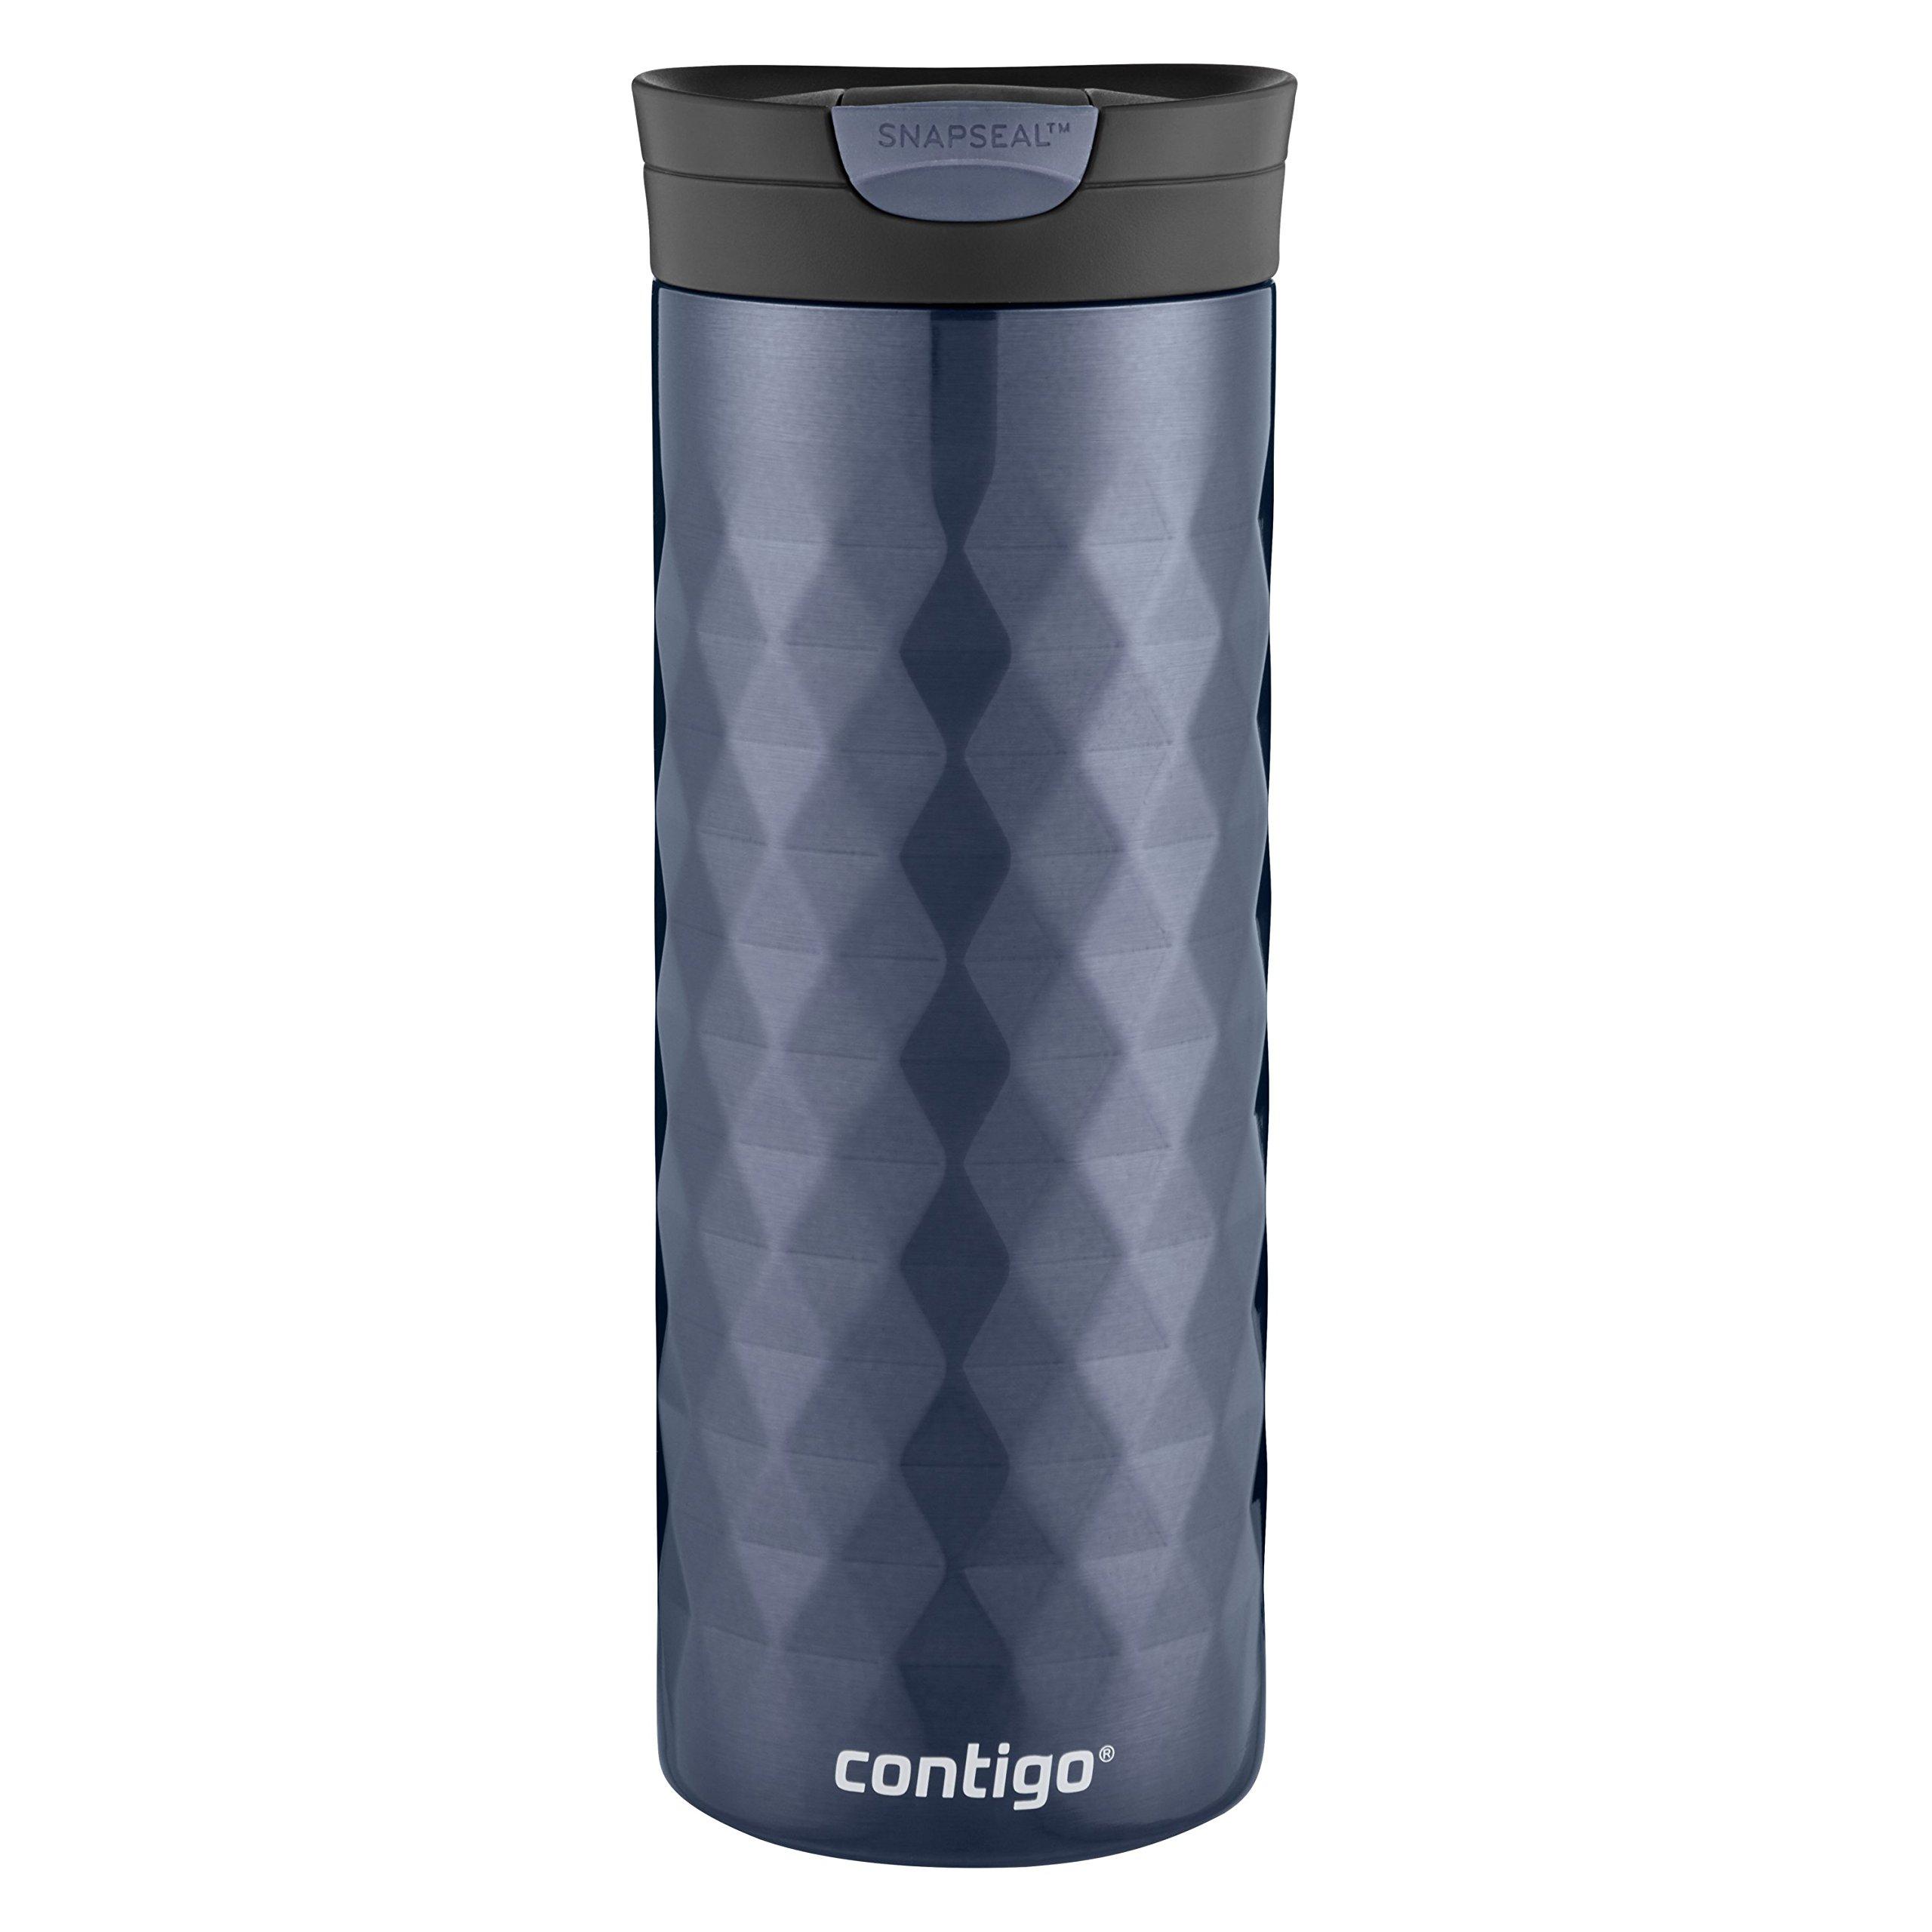 Contigo SnapSeal Kenton Stainless Steel Travel Mug, 20 oz, Serenity